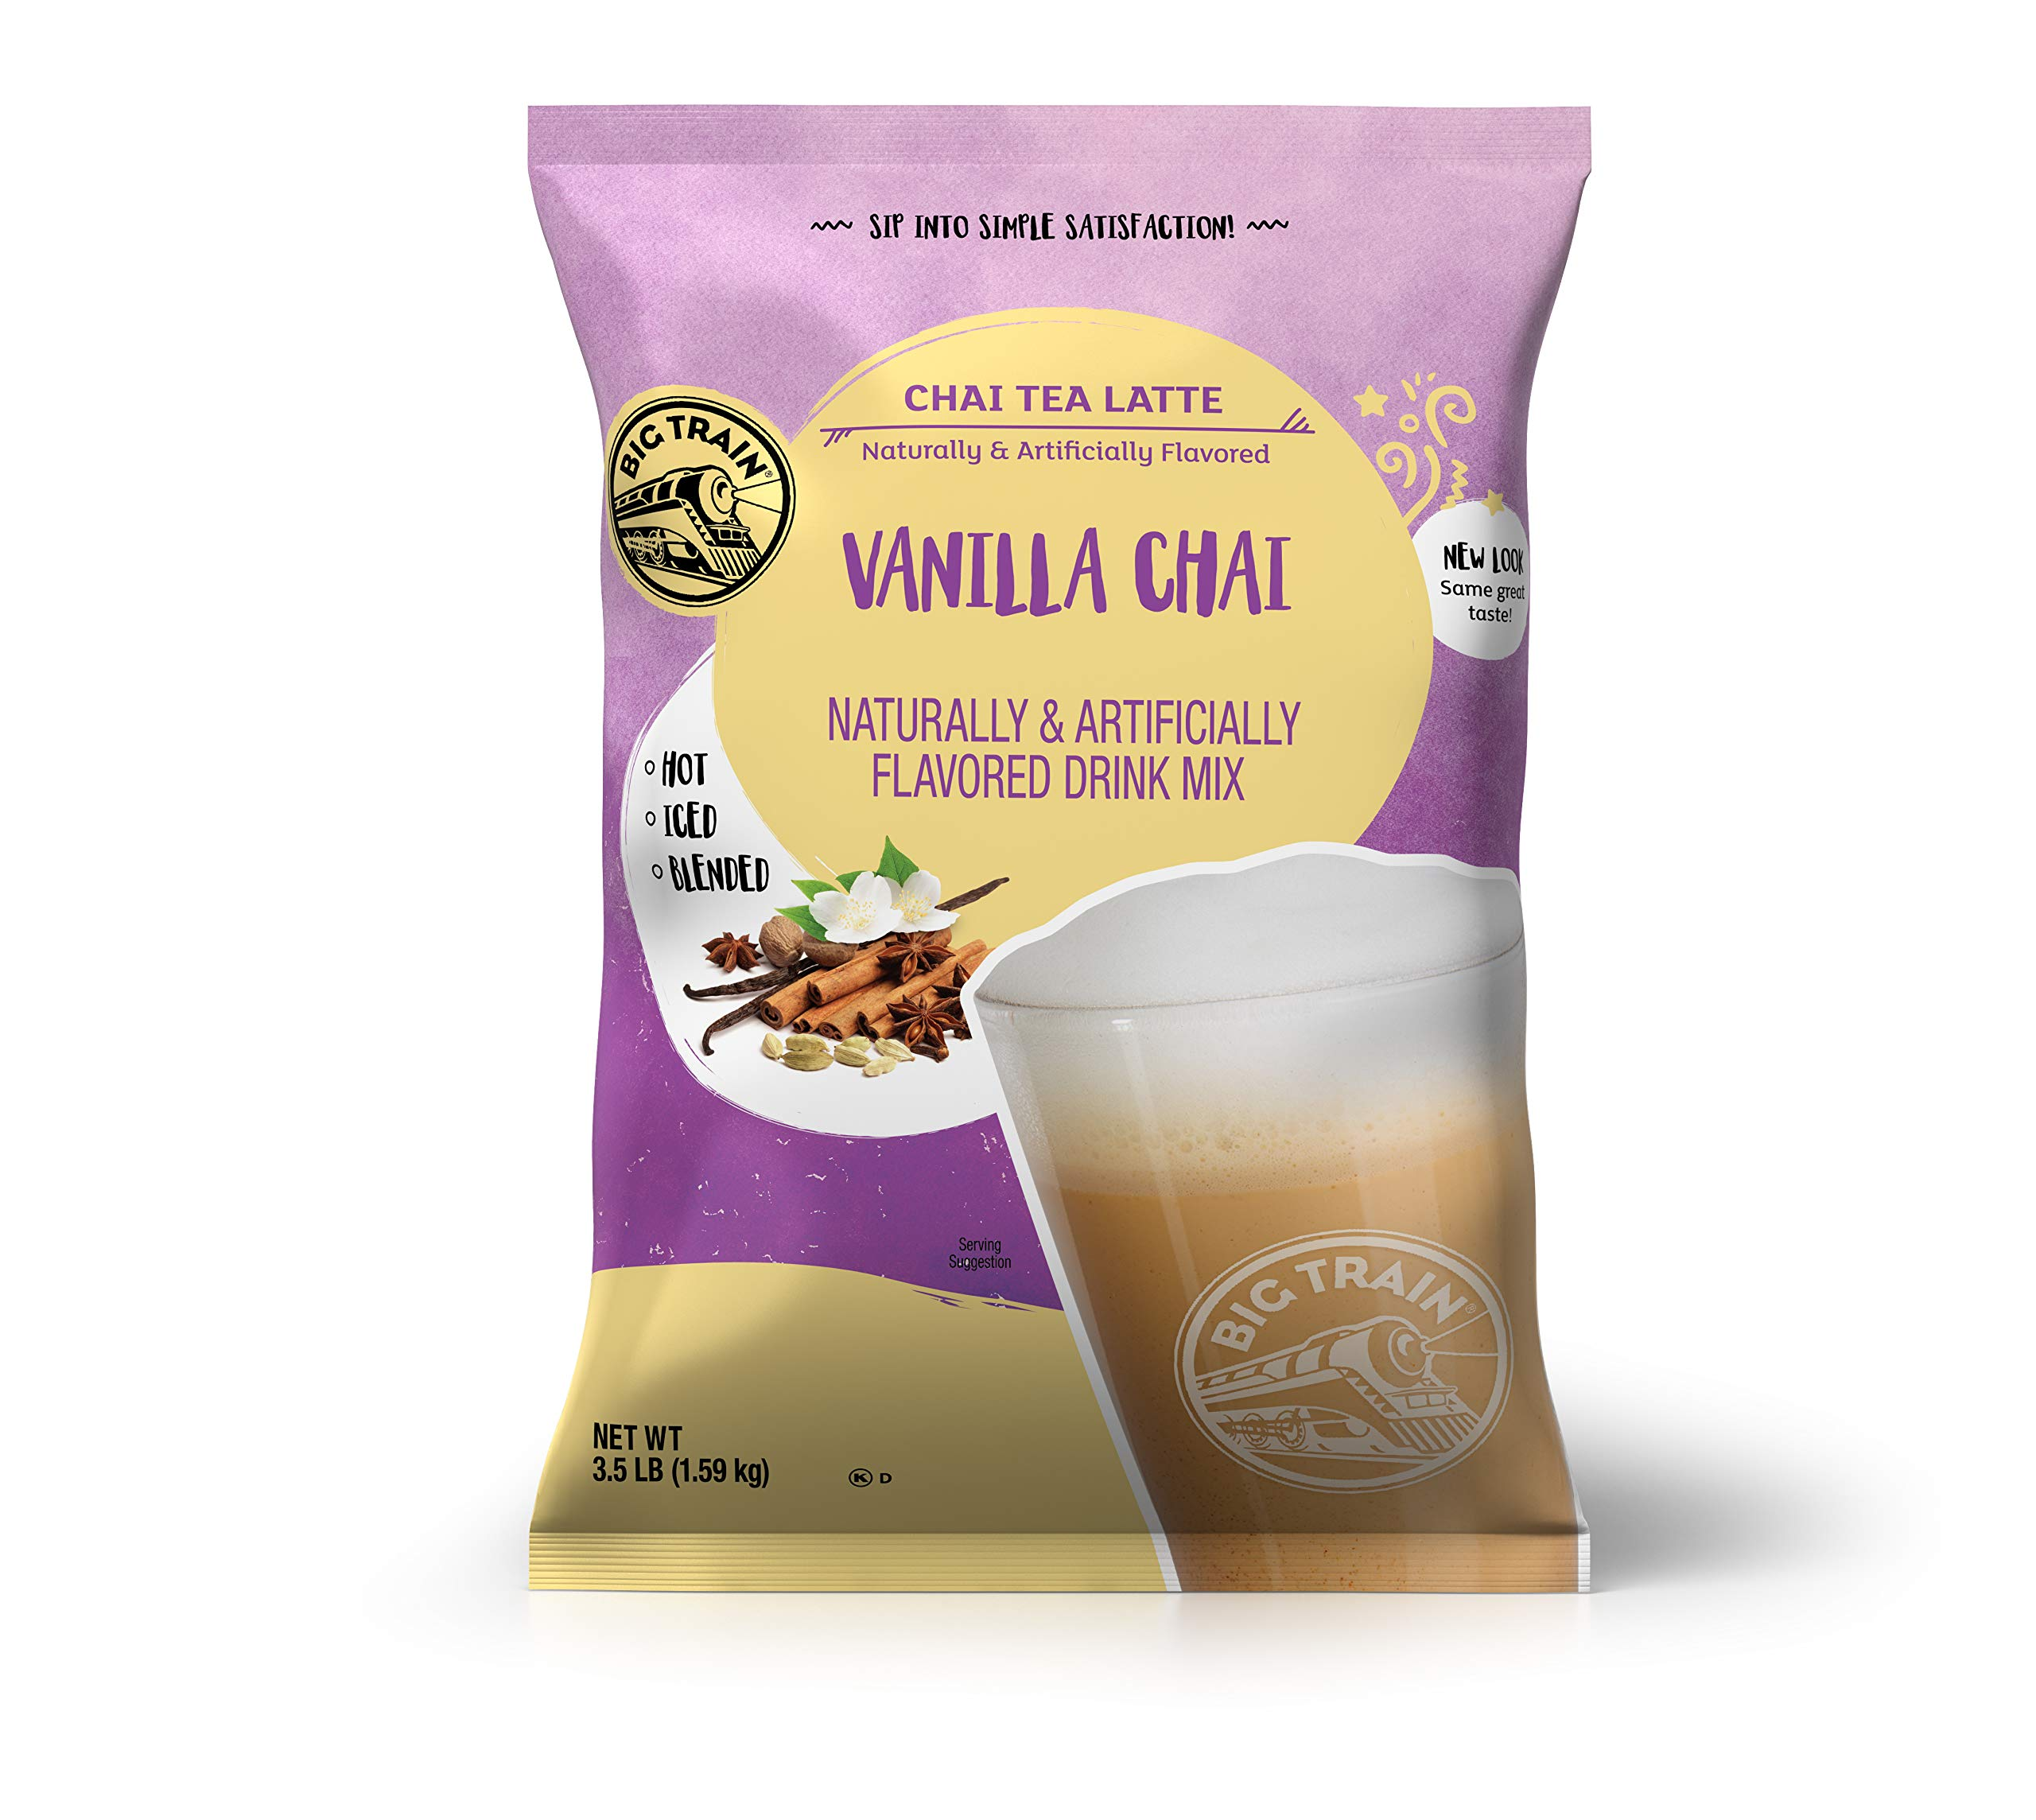 Big Train Vanilla Chai Tea Latte Instant Powdered Mix, 3.5 Pound Bag